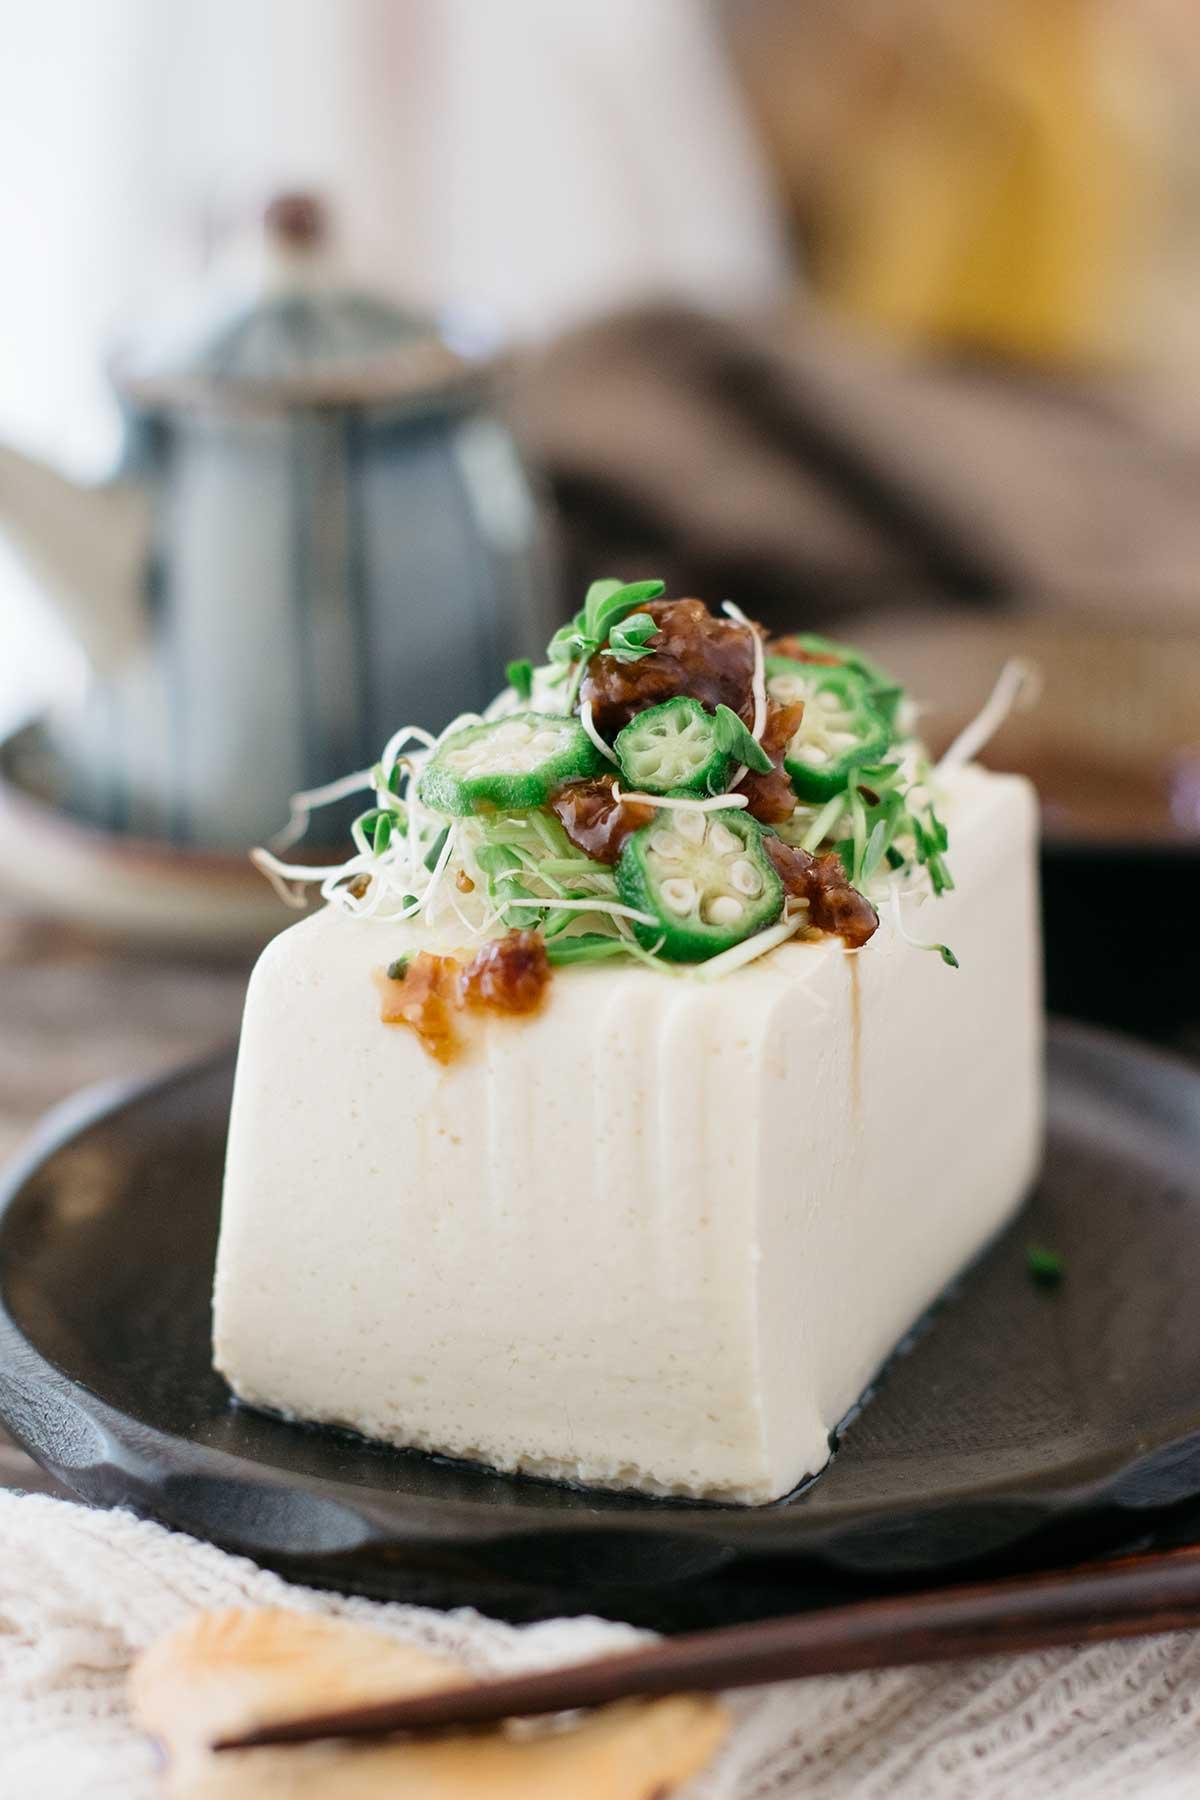 Hiyayakko-with-okura-and-wmeboshi-sauce-3